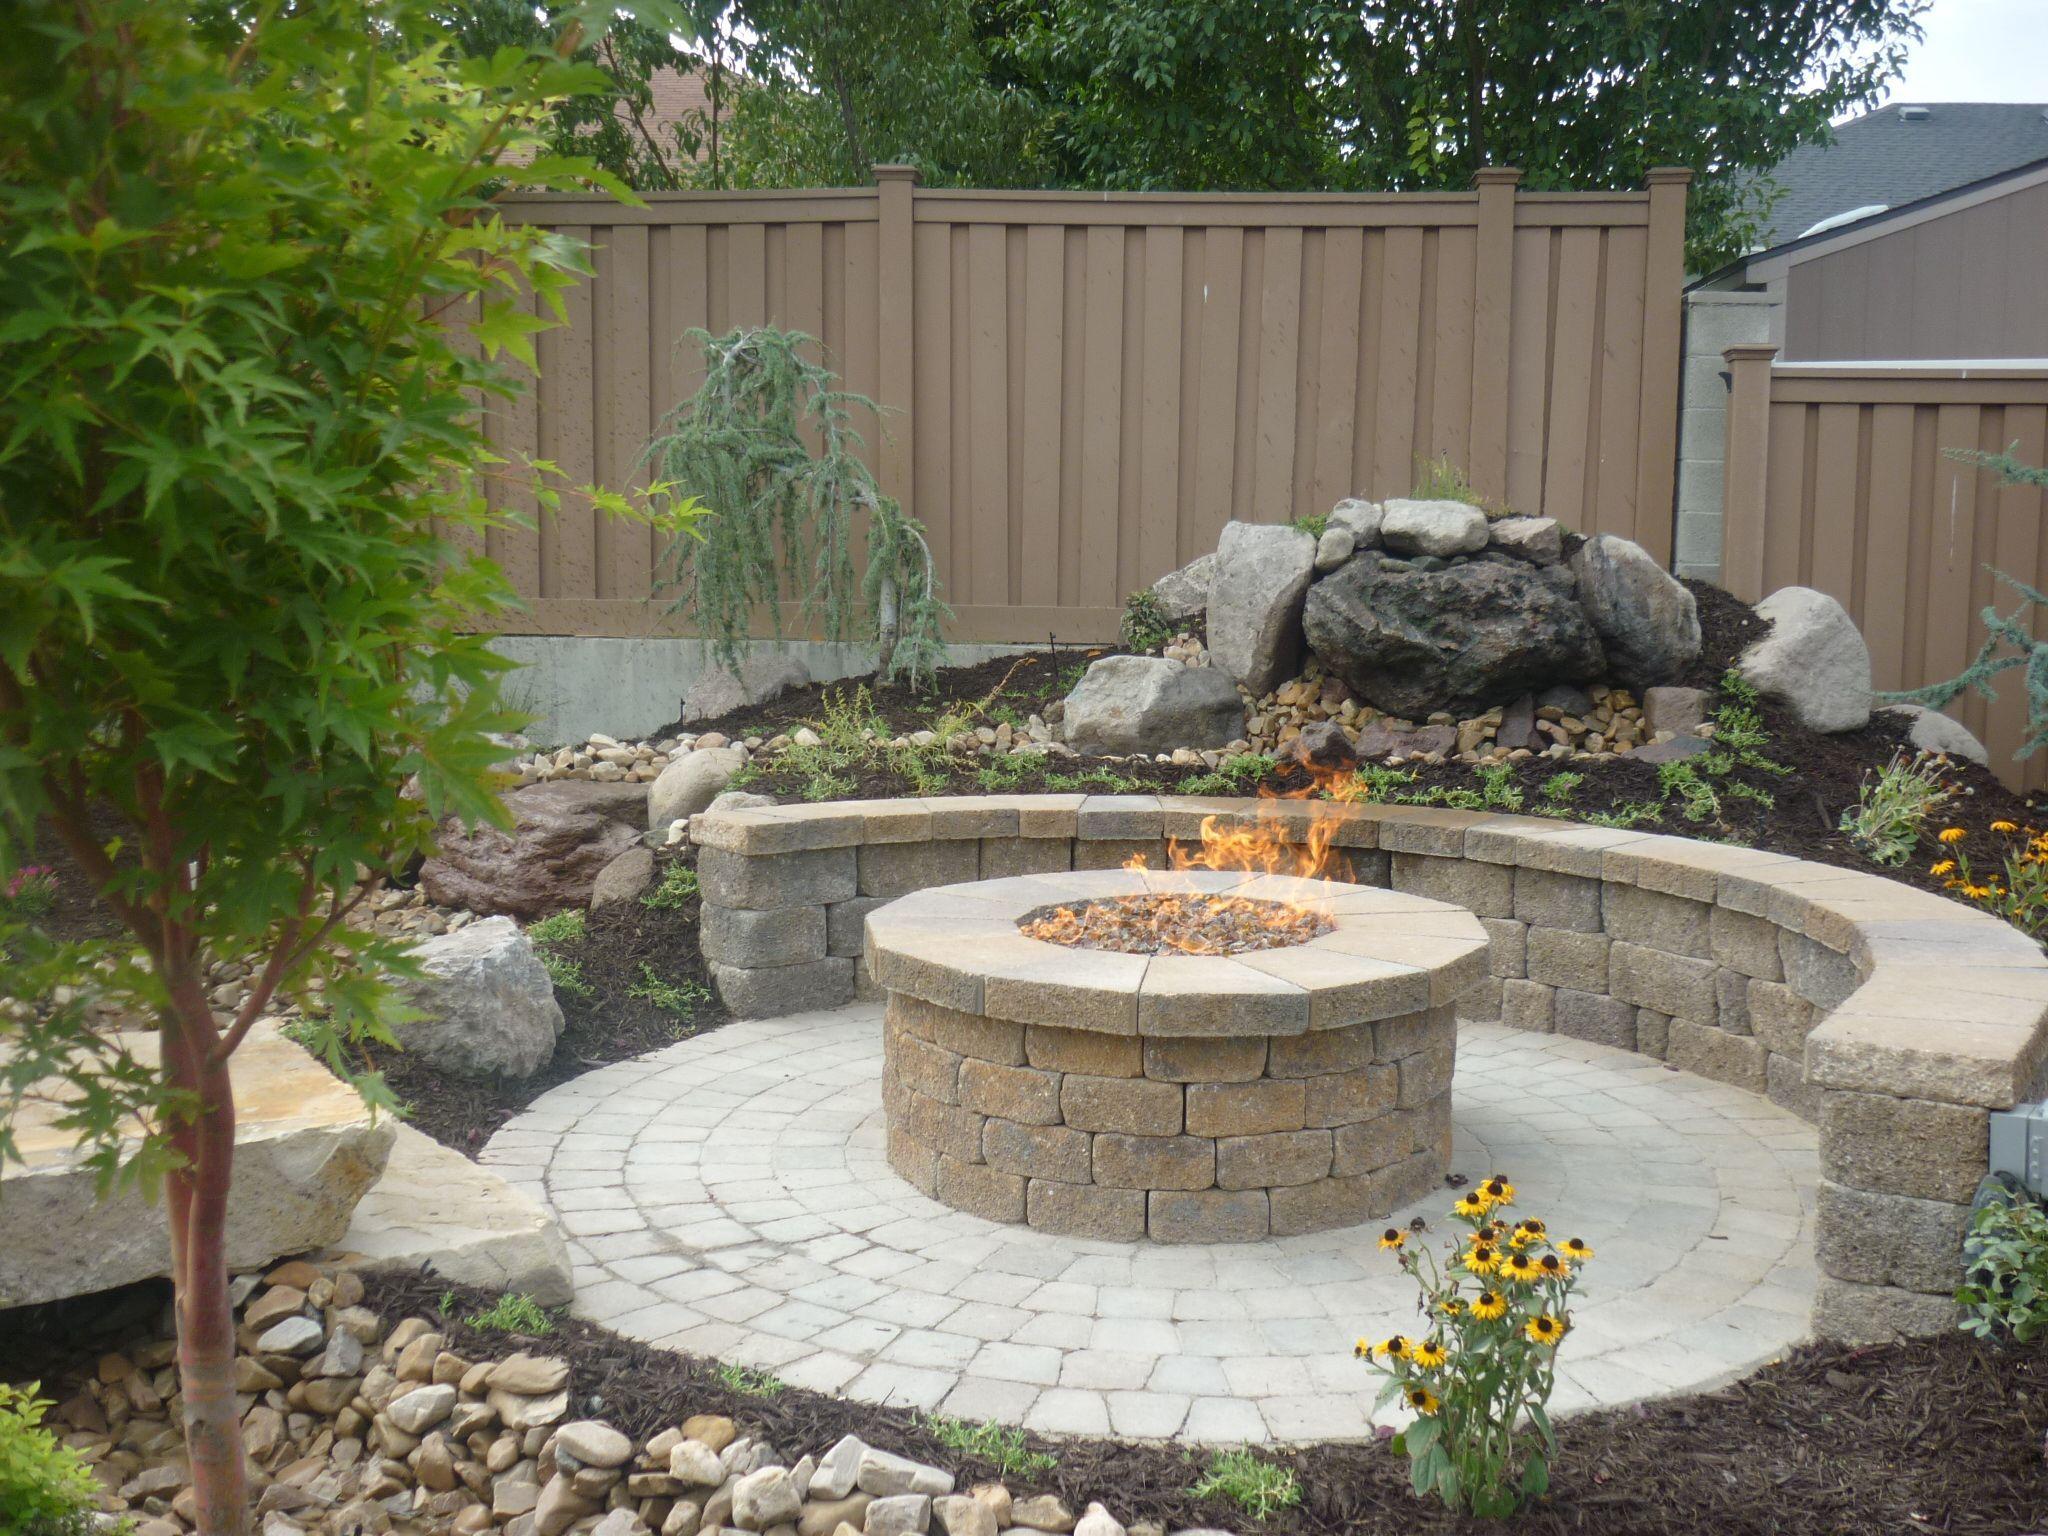 Diy Outdoor Fireplace Brick Pavers Tampa Fl Fire Pit